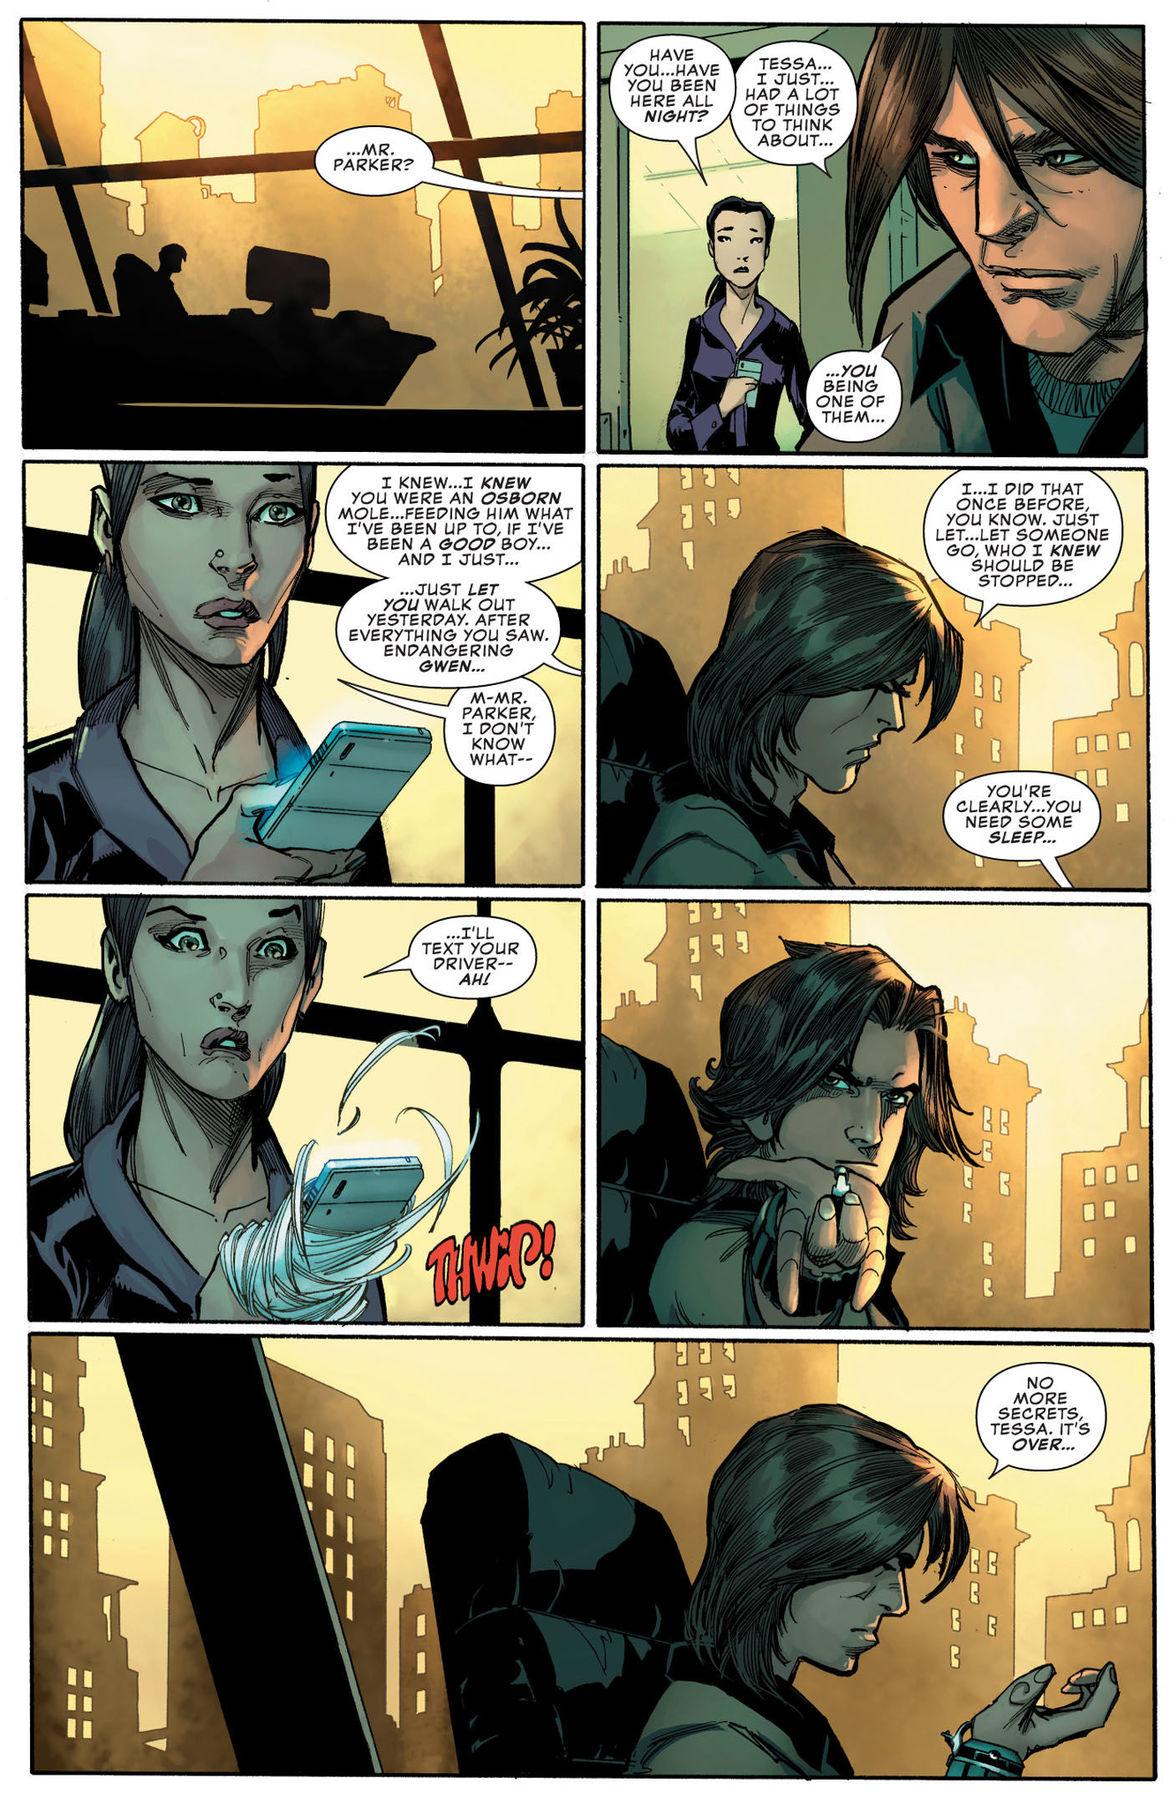 Peter Parker Spectacular Spider-Man 305 page 1